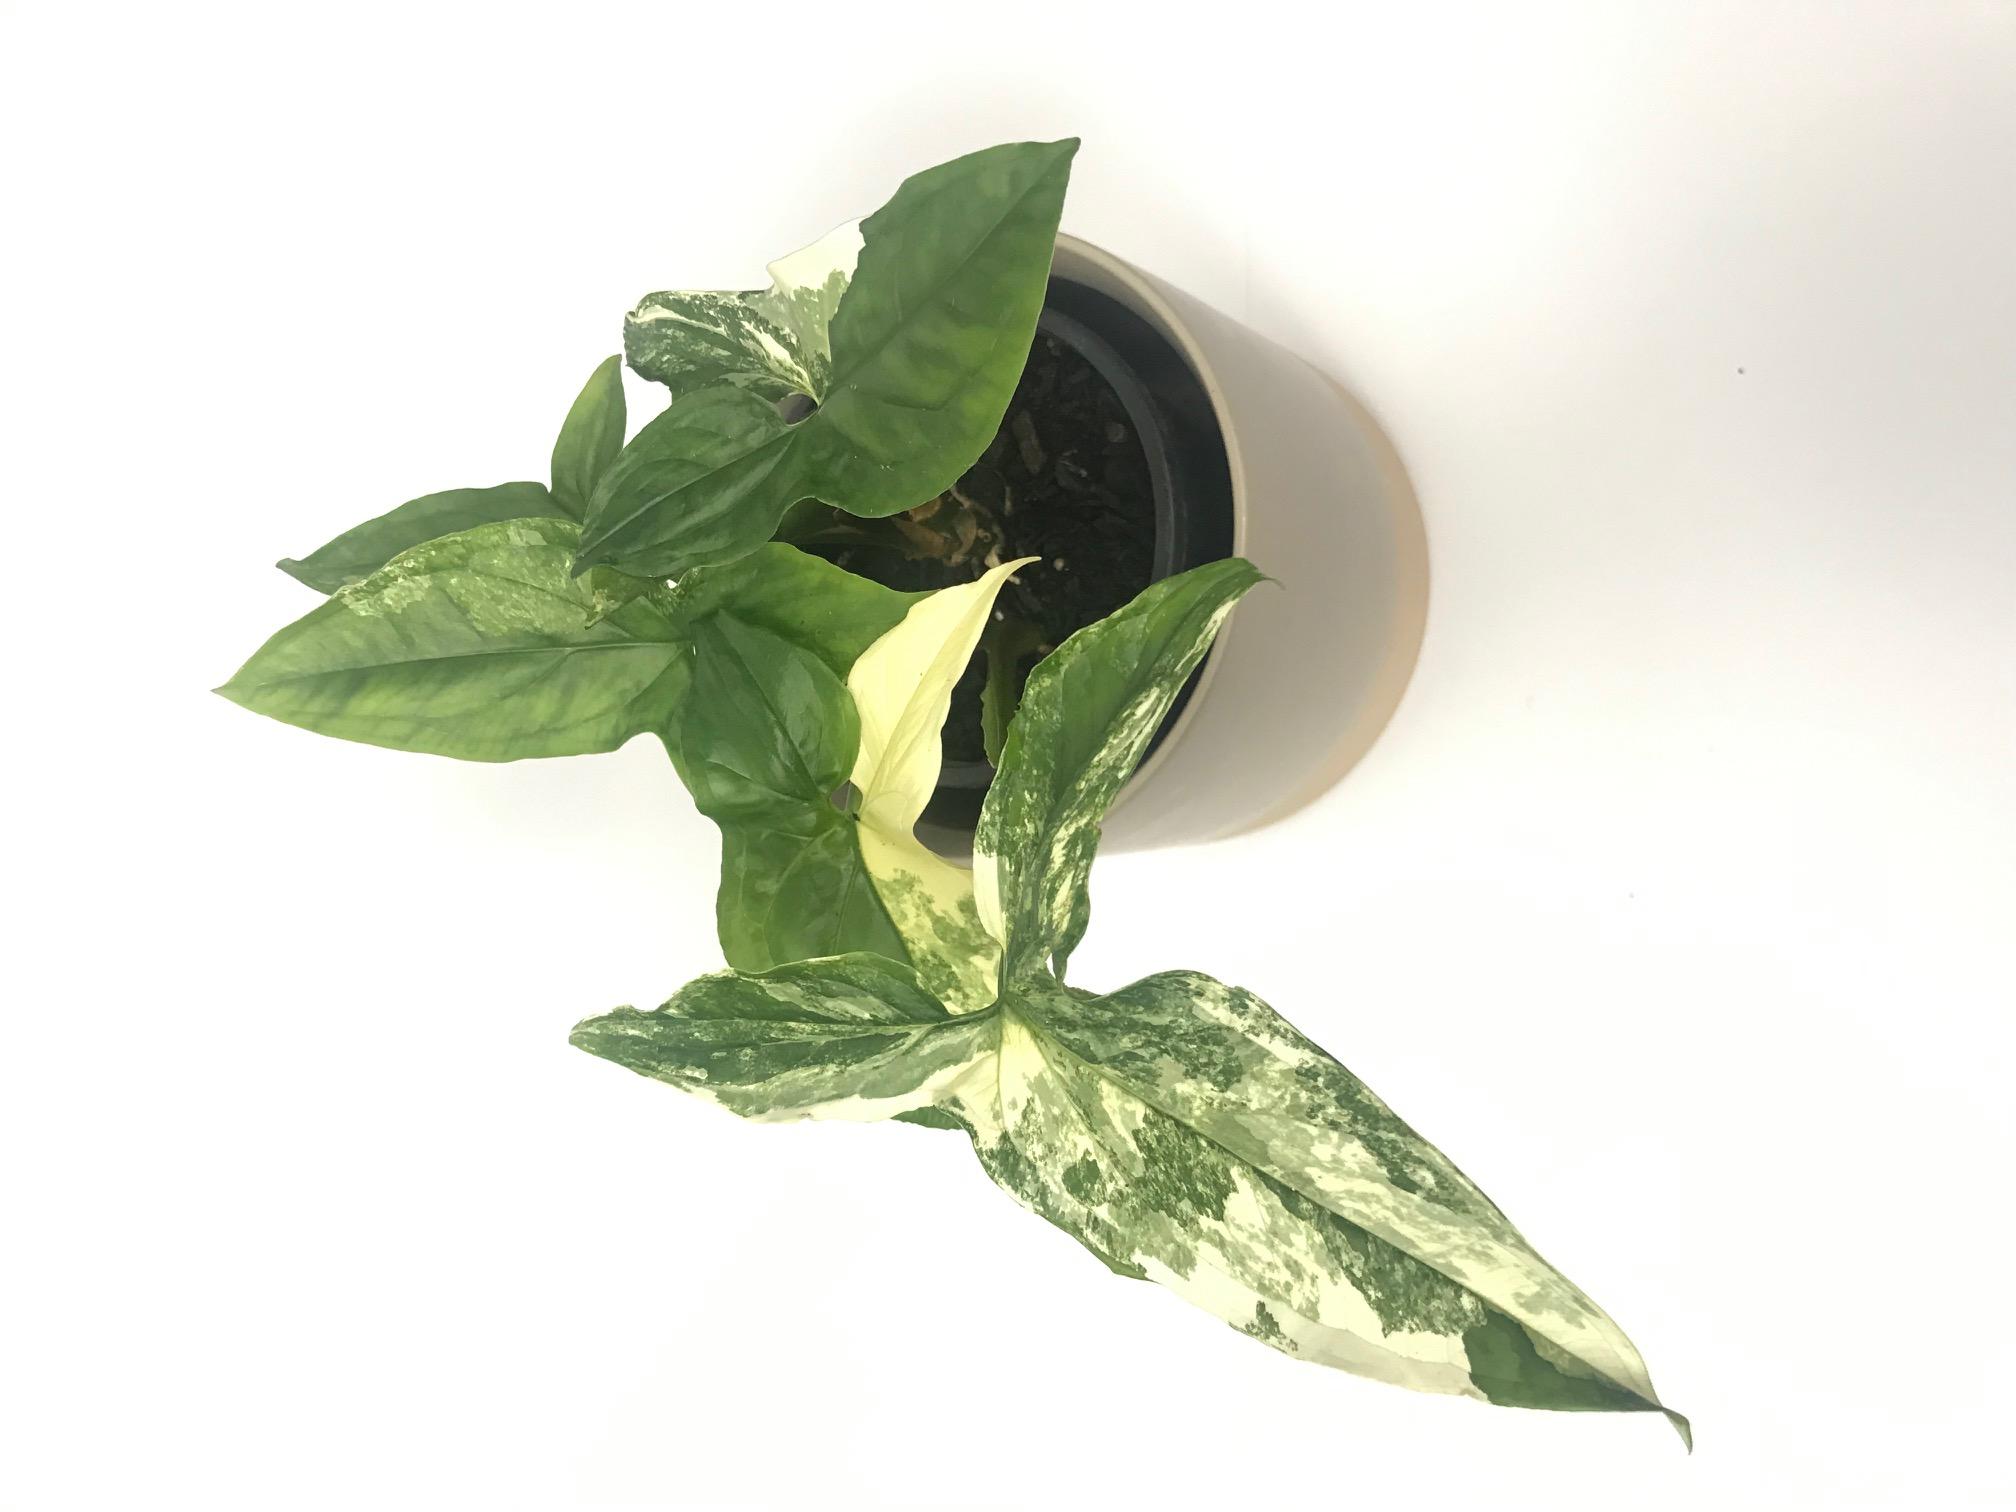 Syngonium Podophylum Albo Variegatum var